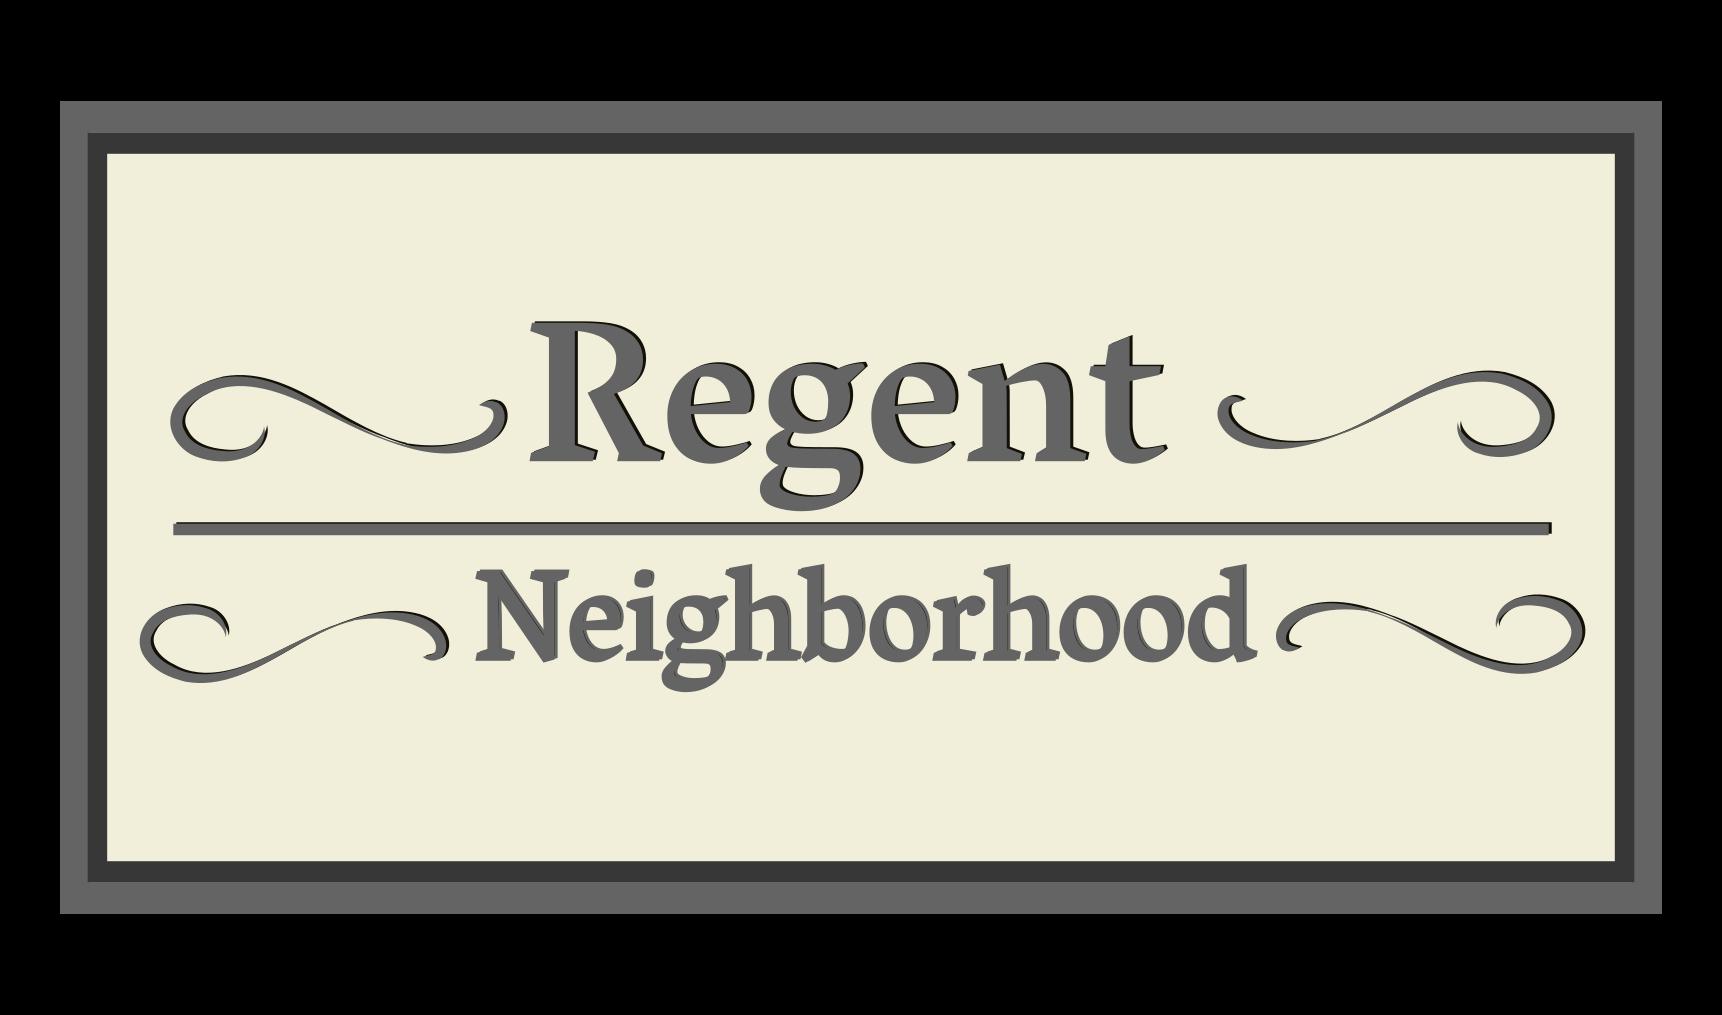 The Regent Neighborhood of Madison